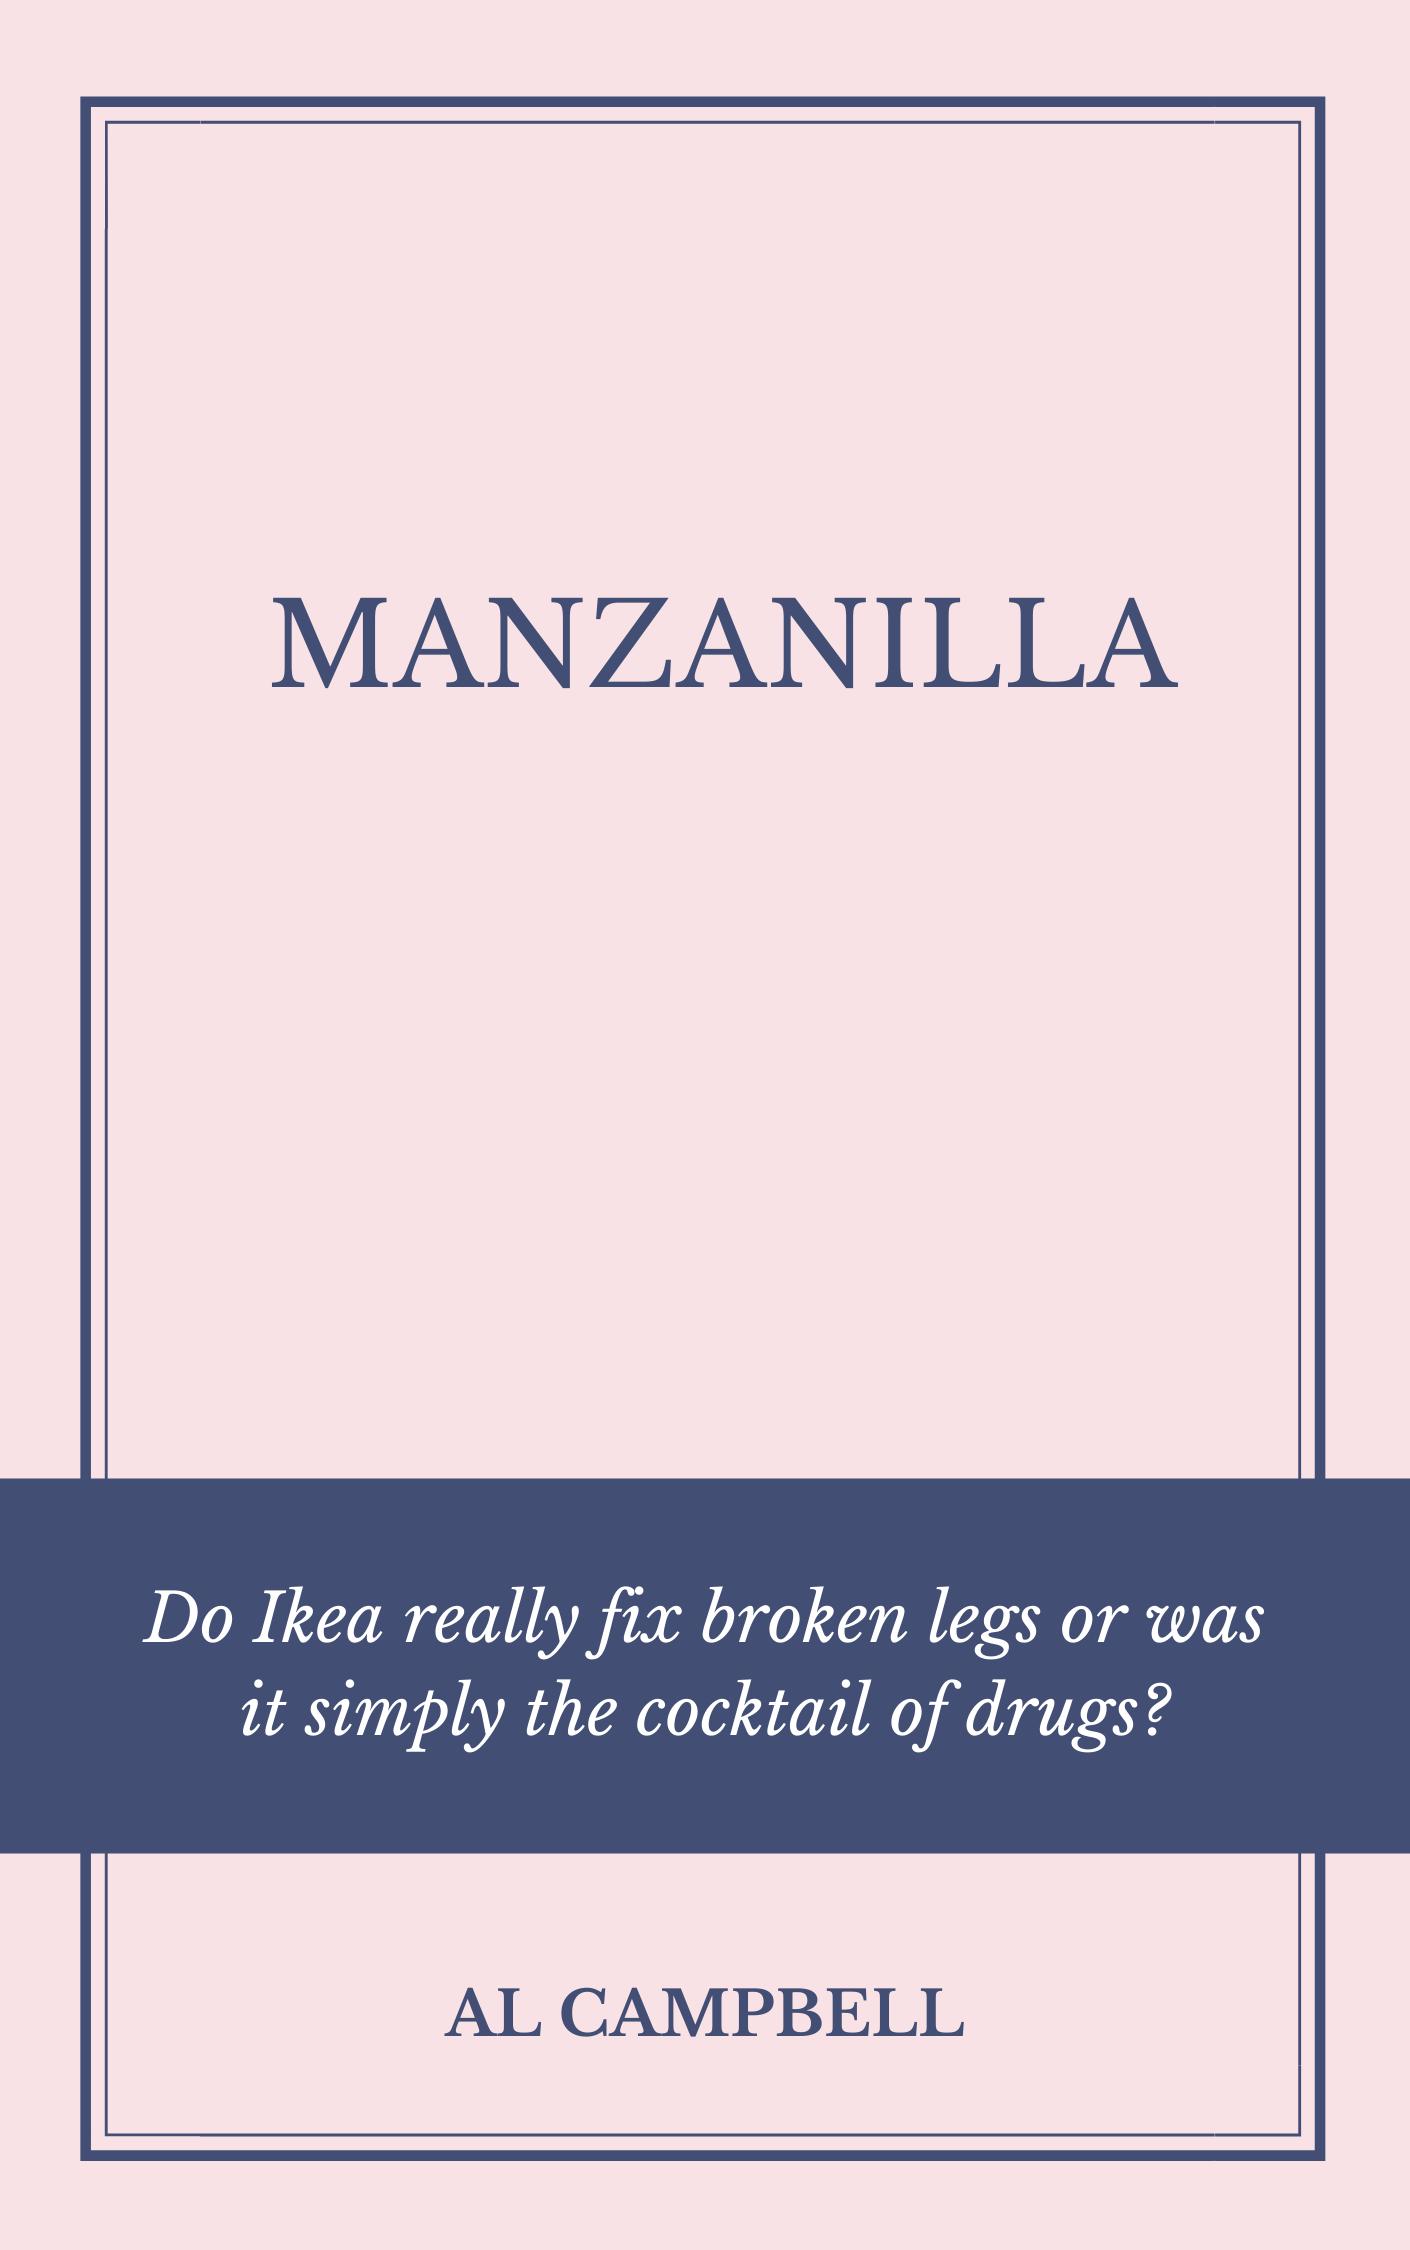 MANZANILLA - By Al Campbell